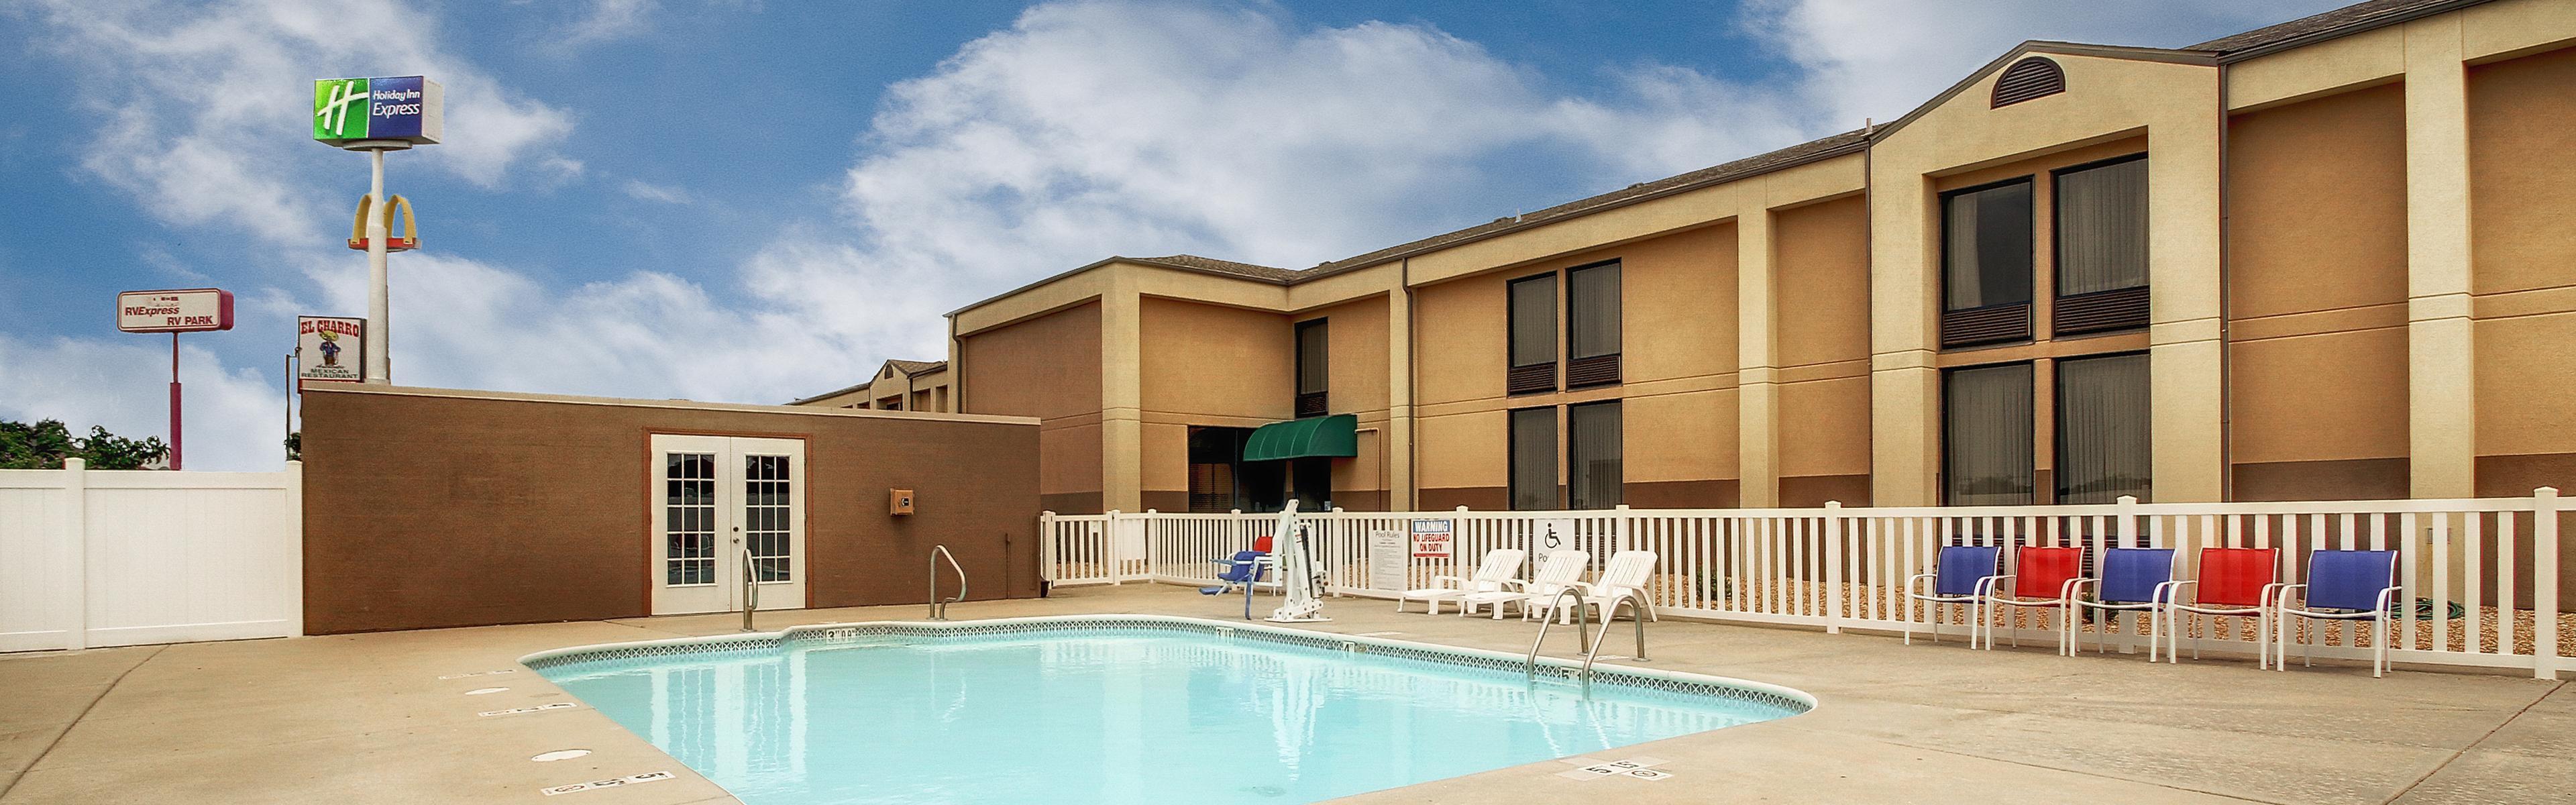 Holiday Inn Express Marshfield (Springfield Area) image 1